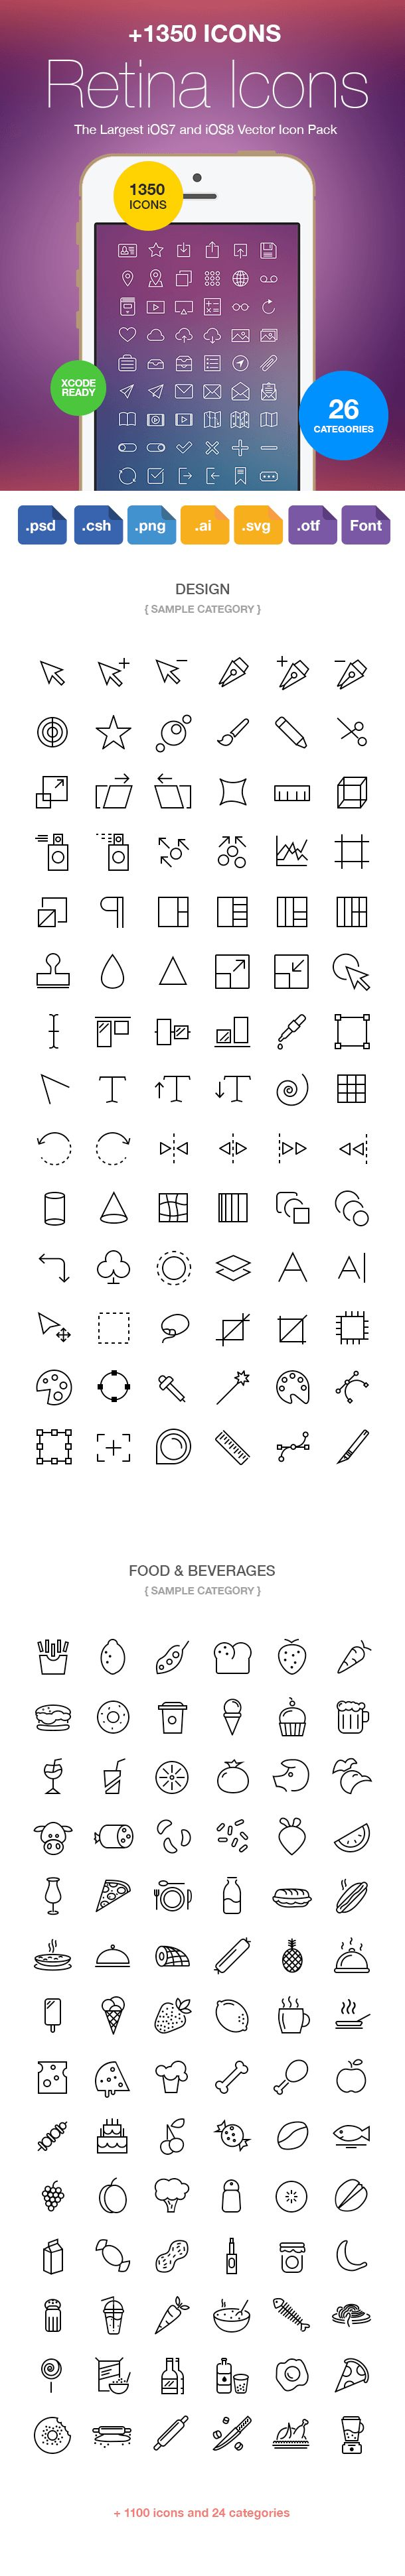 Retina Icons: 1350+ Vector Icons For iOS 8 & iOS 7 | StackSocial